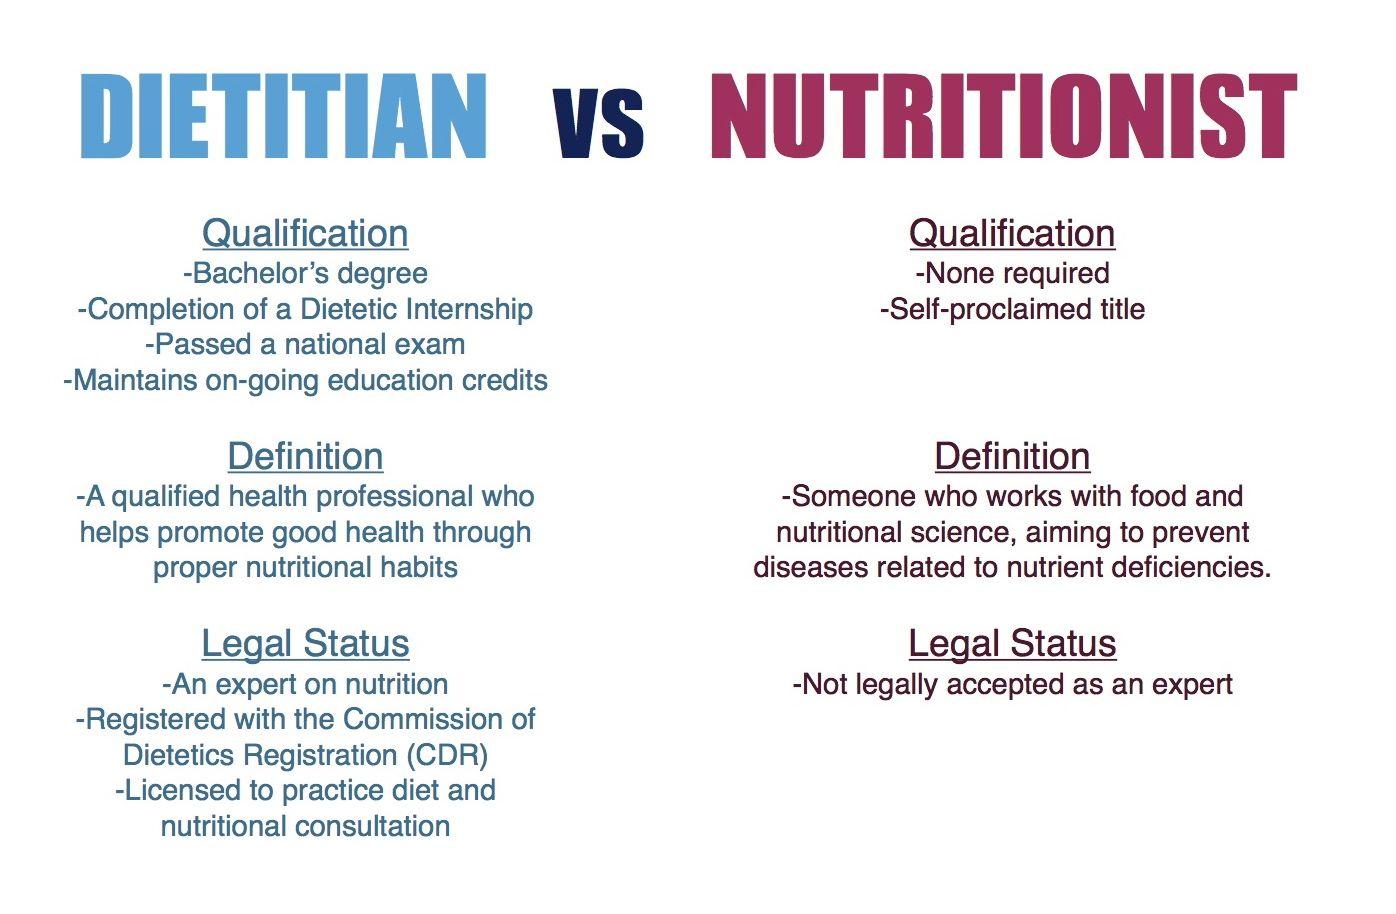 I want to study dietetics